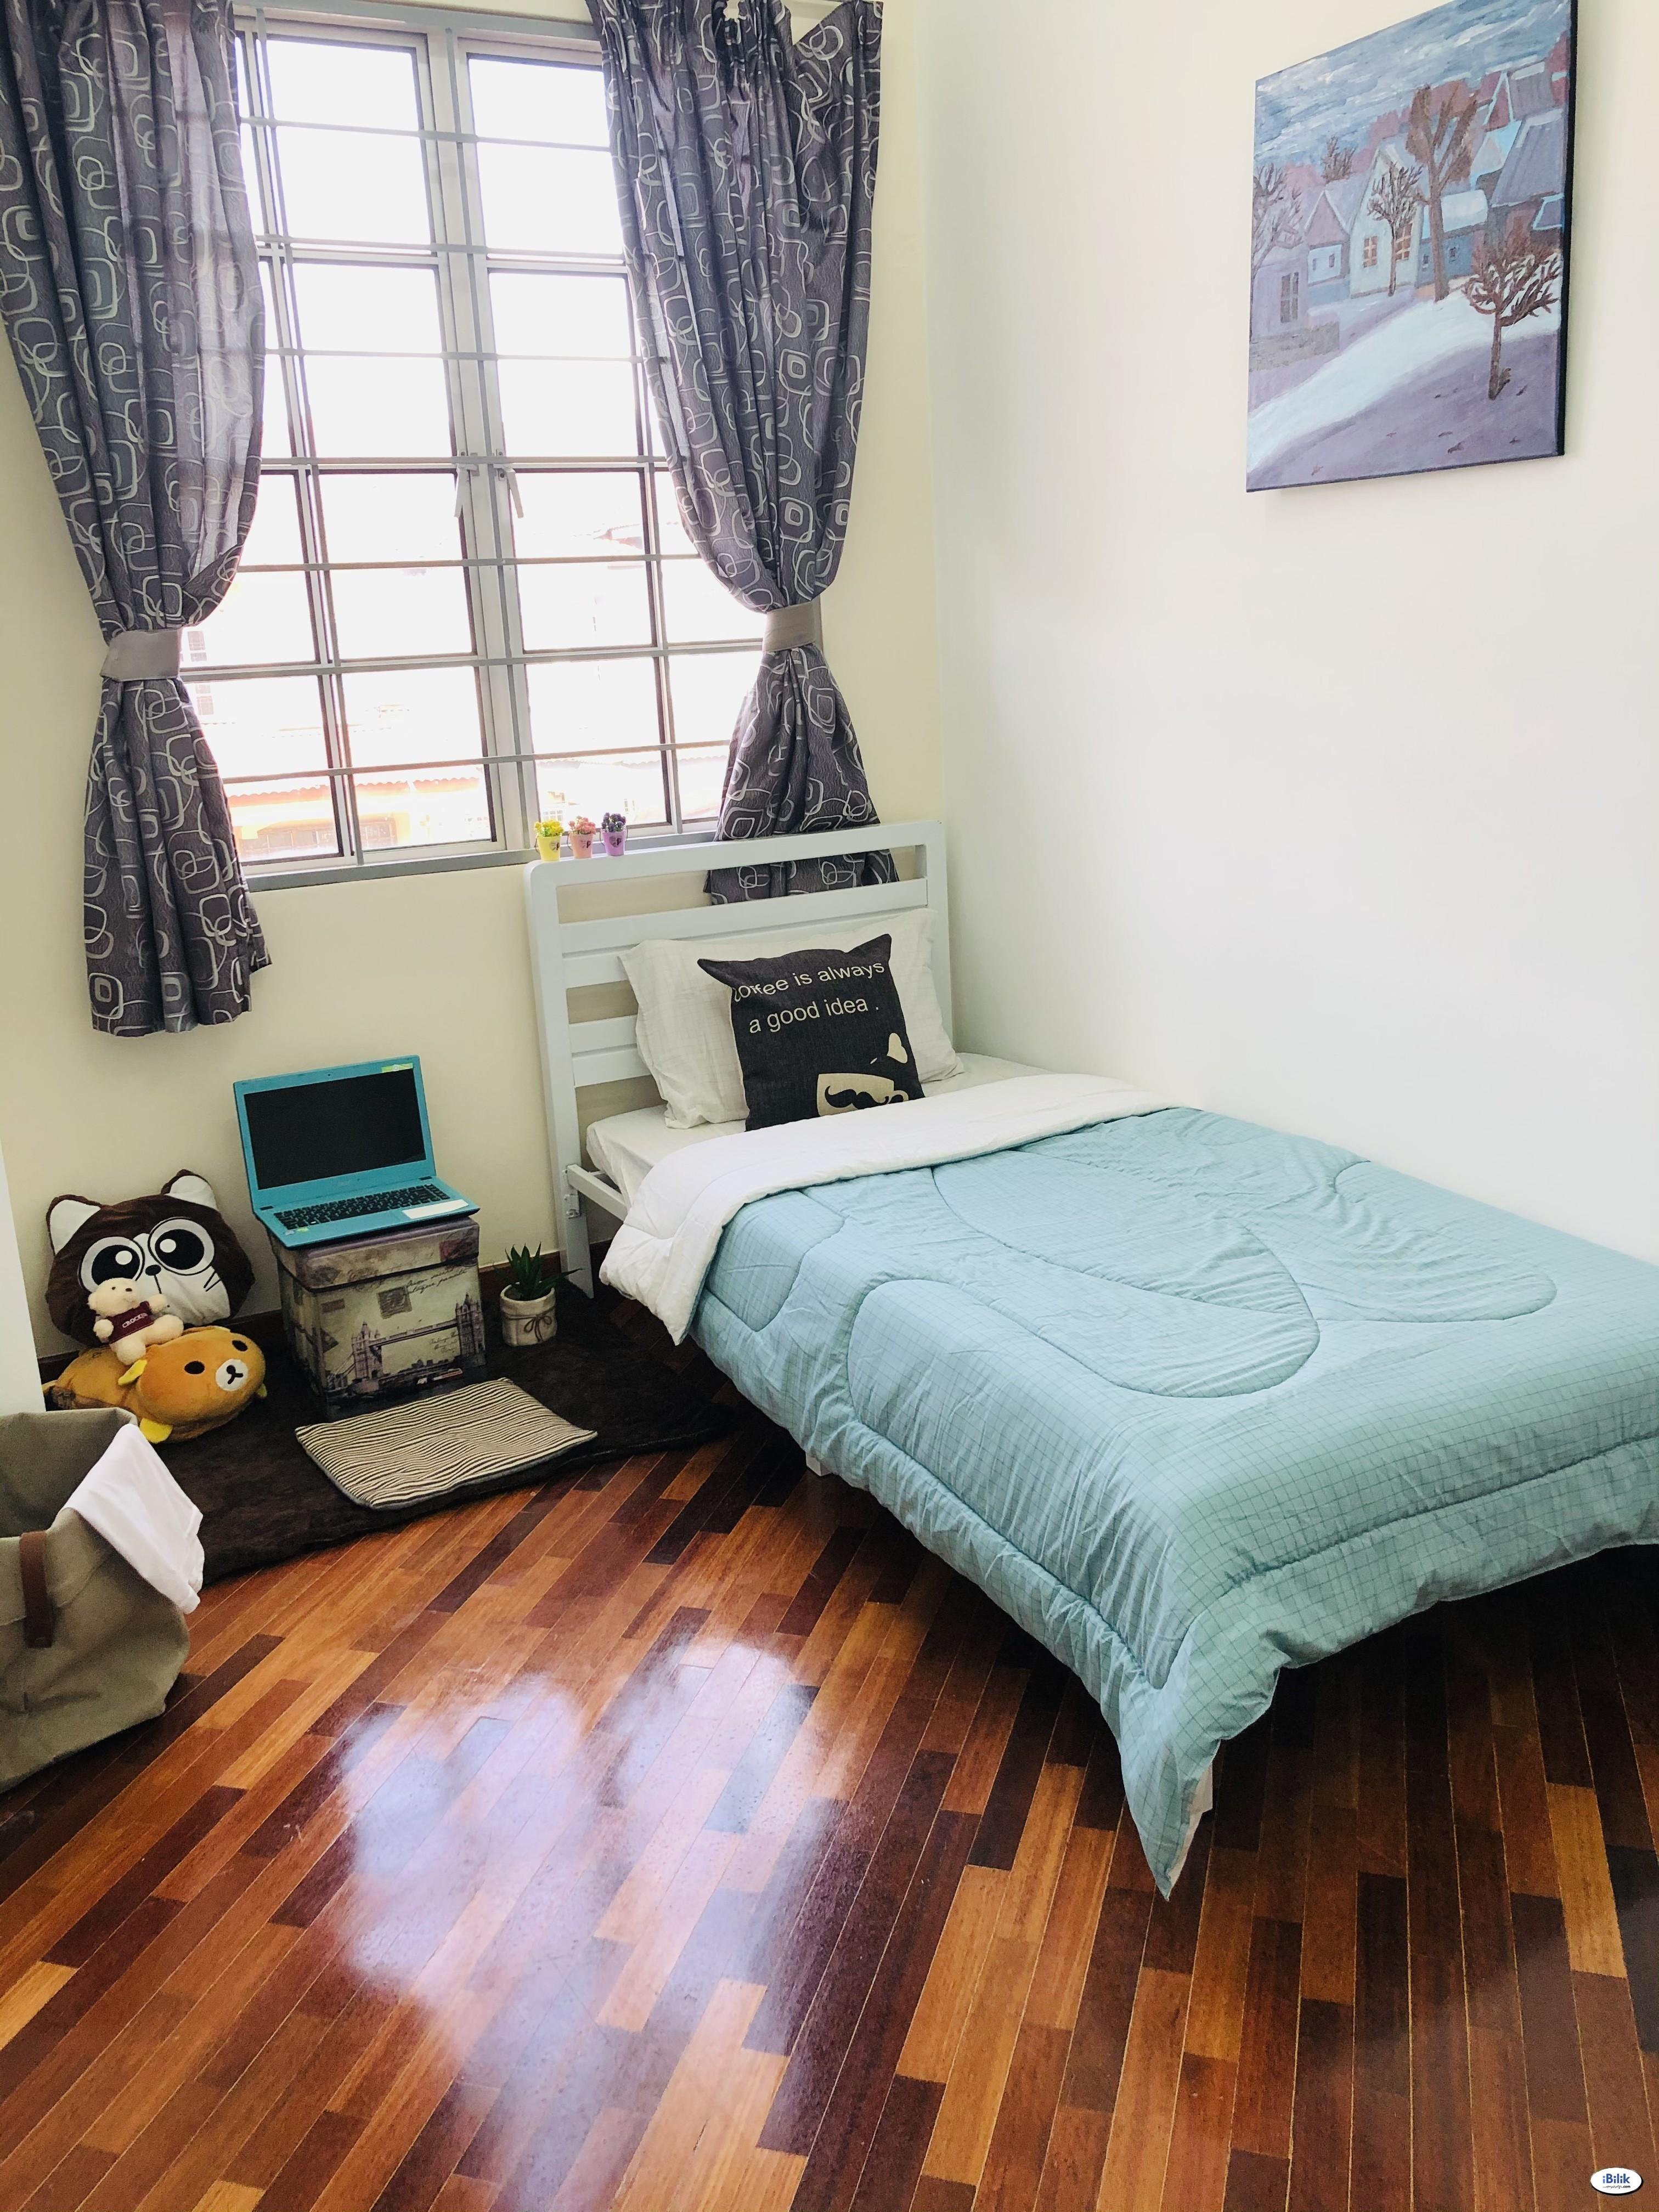 🌈Medium Room for rent near LRT Station Bandar Puchong Jaya🌈